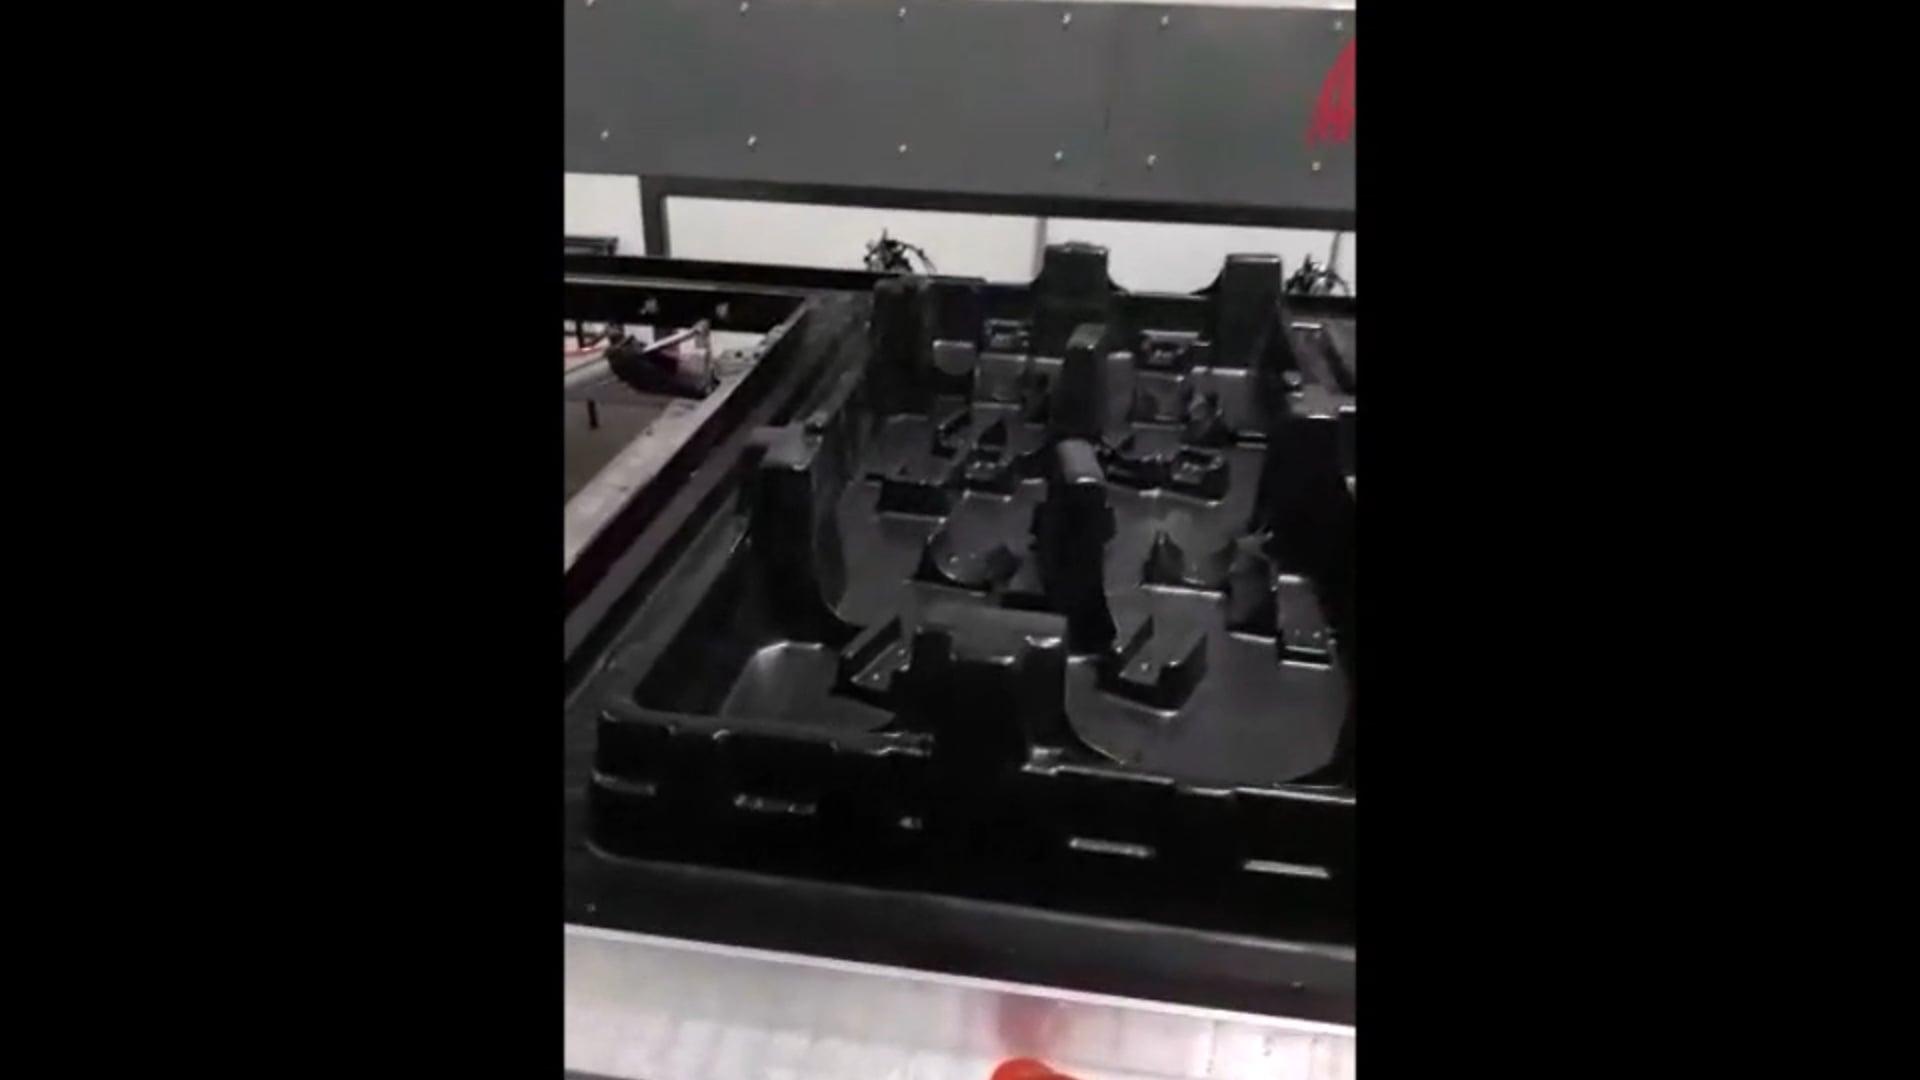 Avan-Tec T5500 Thermoforming Working